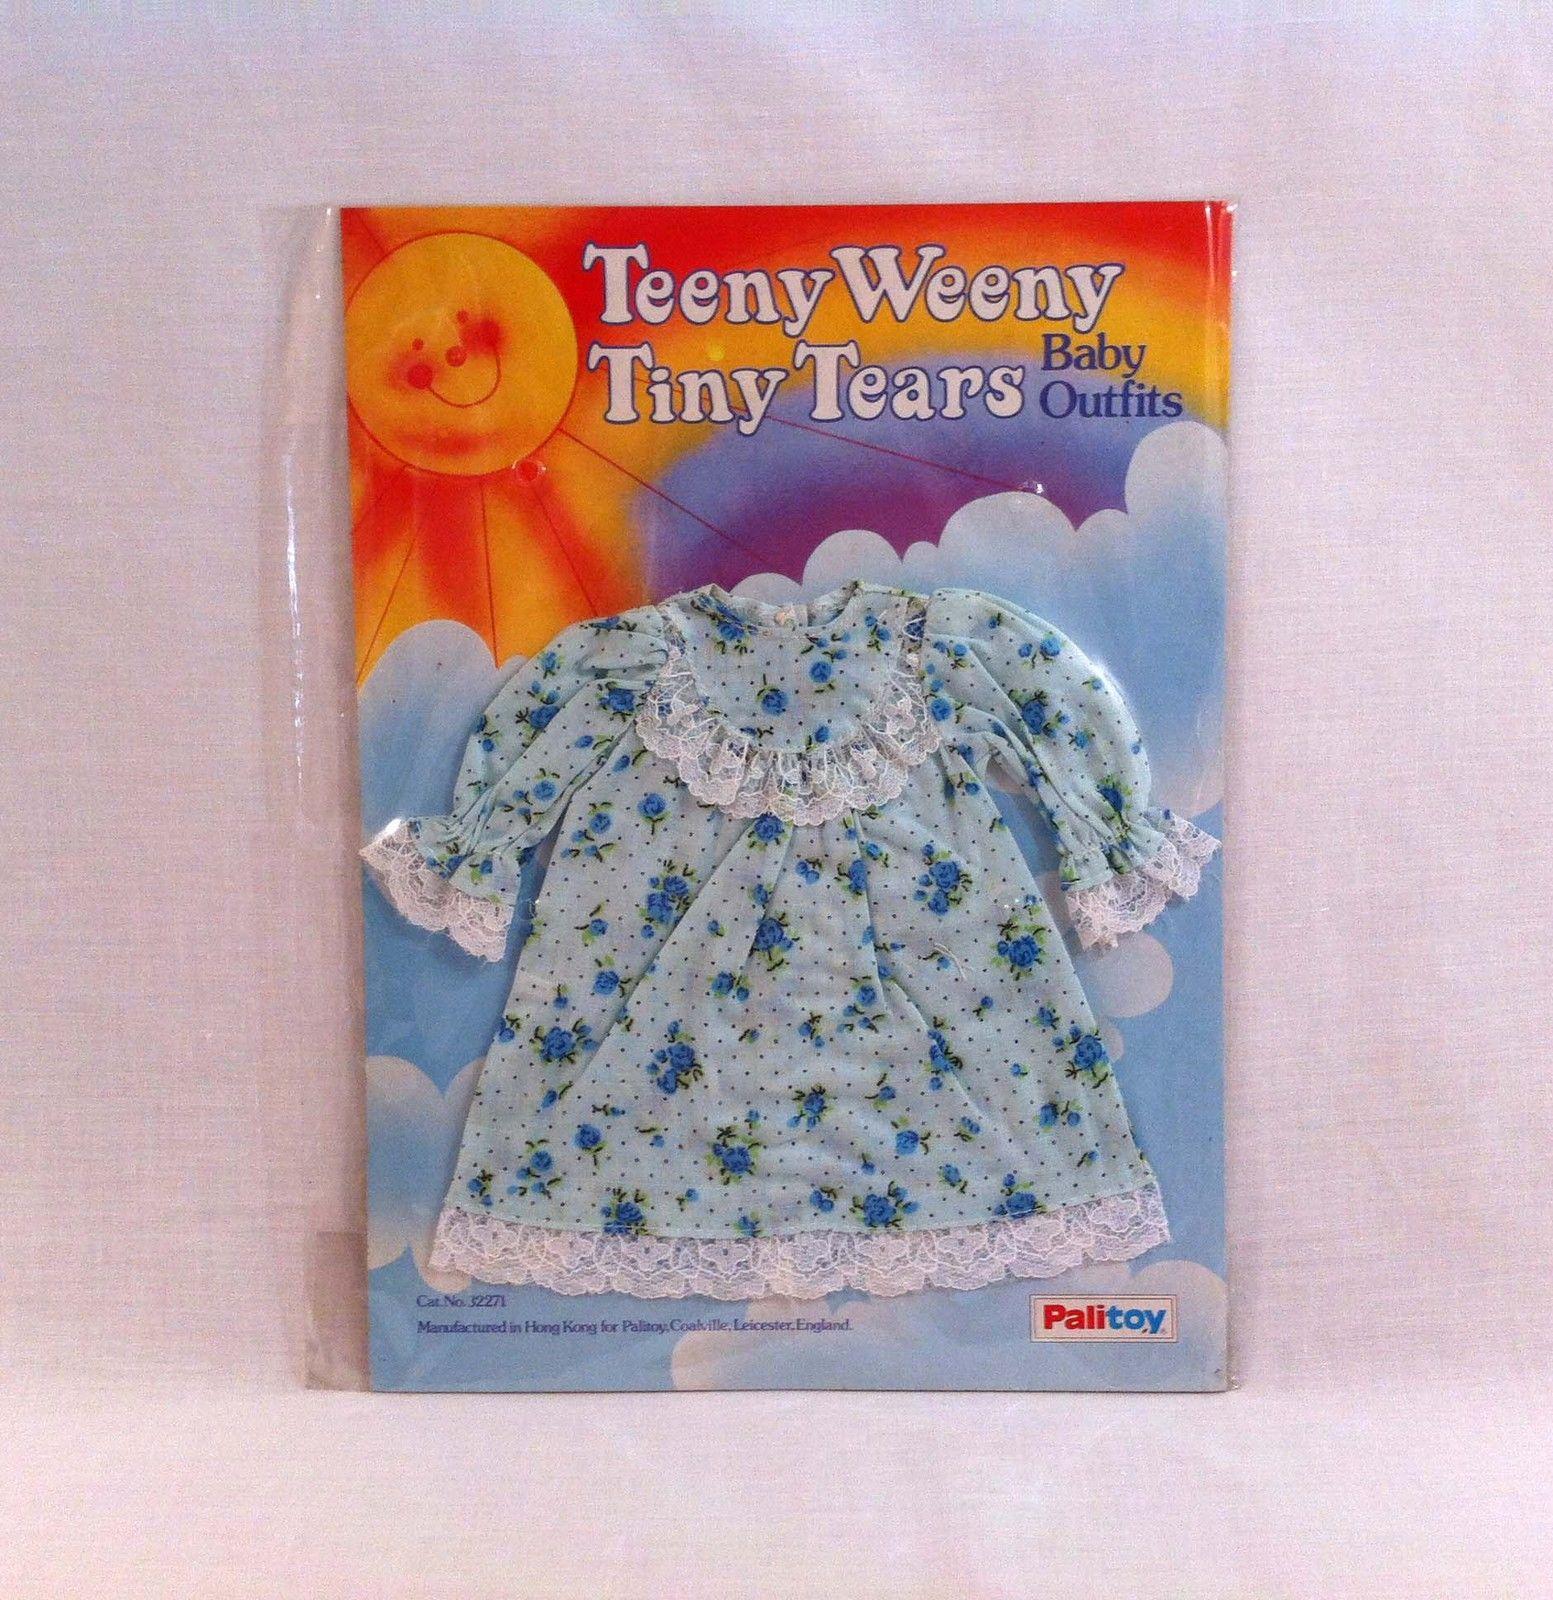 NEW 1980s Palitoy ☆ Teeny Weeny Tiny Tears ☆ Vintage Baby Outfit #32271   eBay